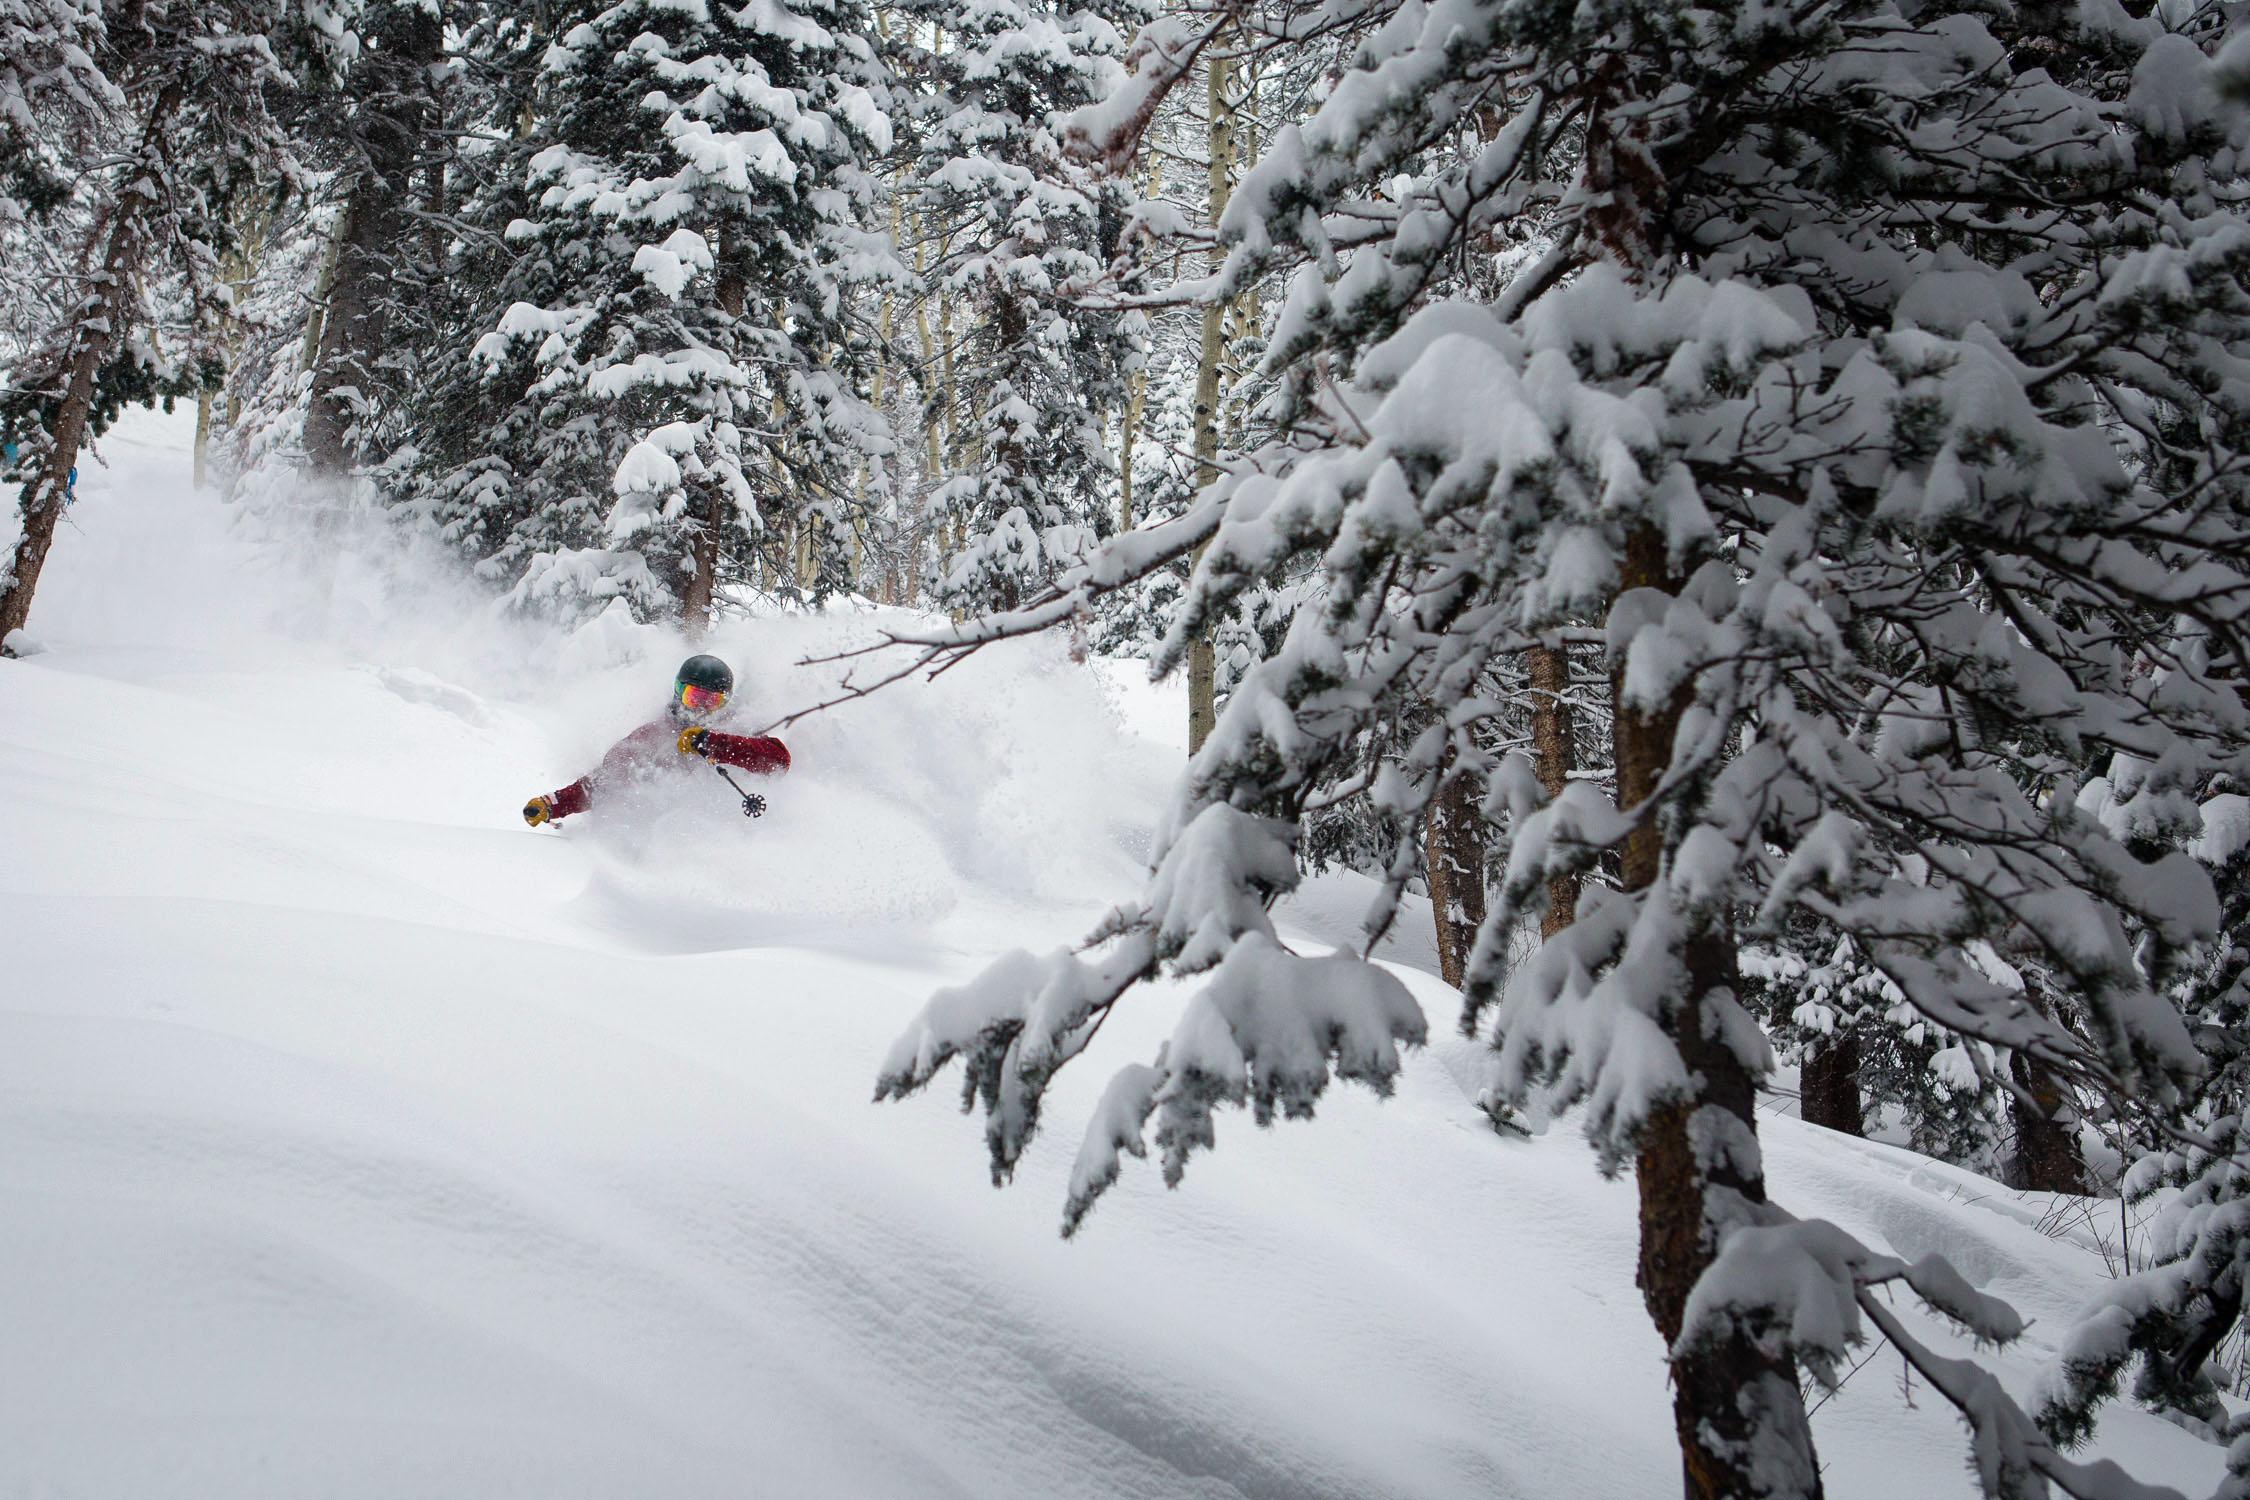 Aspen Snowmass January 31, 2016 powder skiing